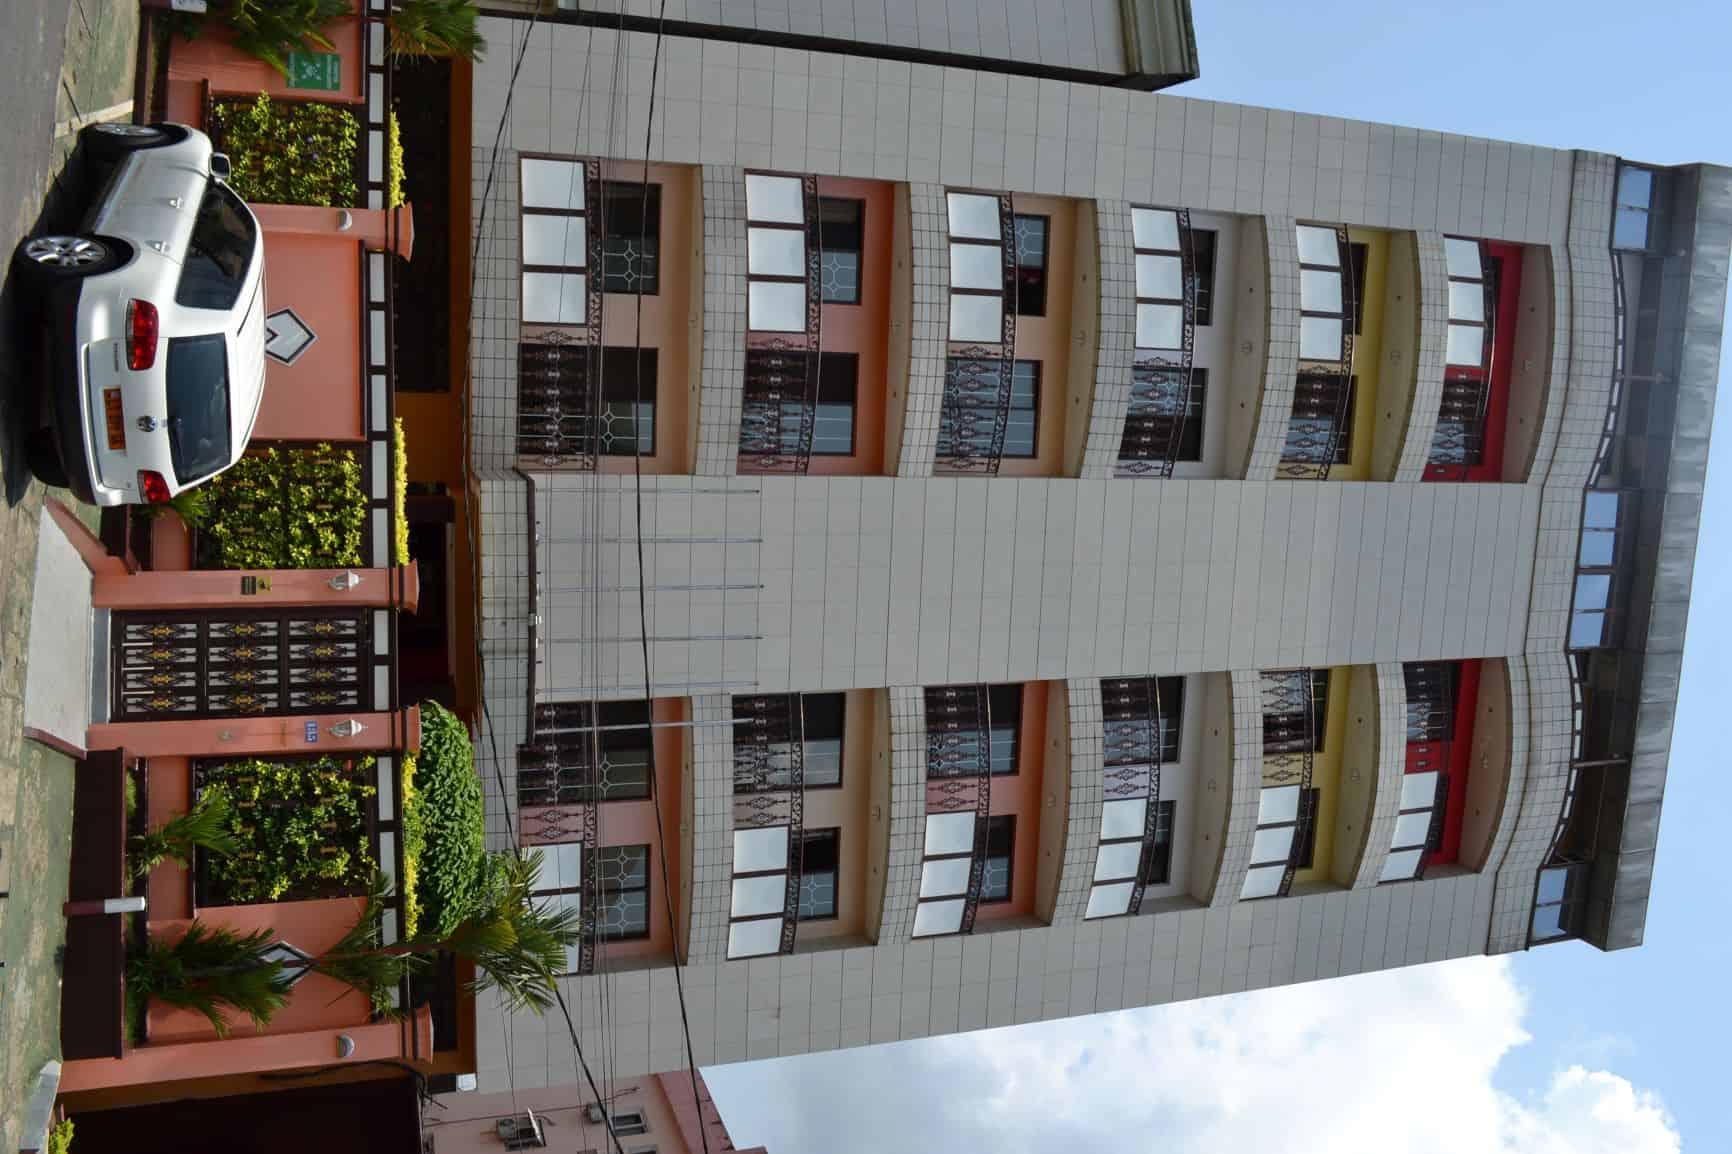 Apartment to rent - Douala, Bonanjo, Face Commissariat EMI-IMMIGRATION - 1 living room(s), 1 bedroom(s), 1 bathroom(s) - 450 000 FCFA / month